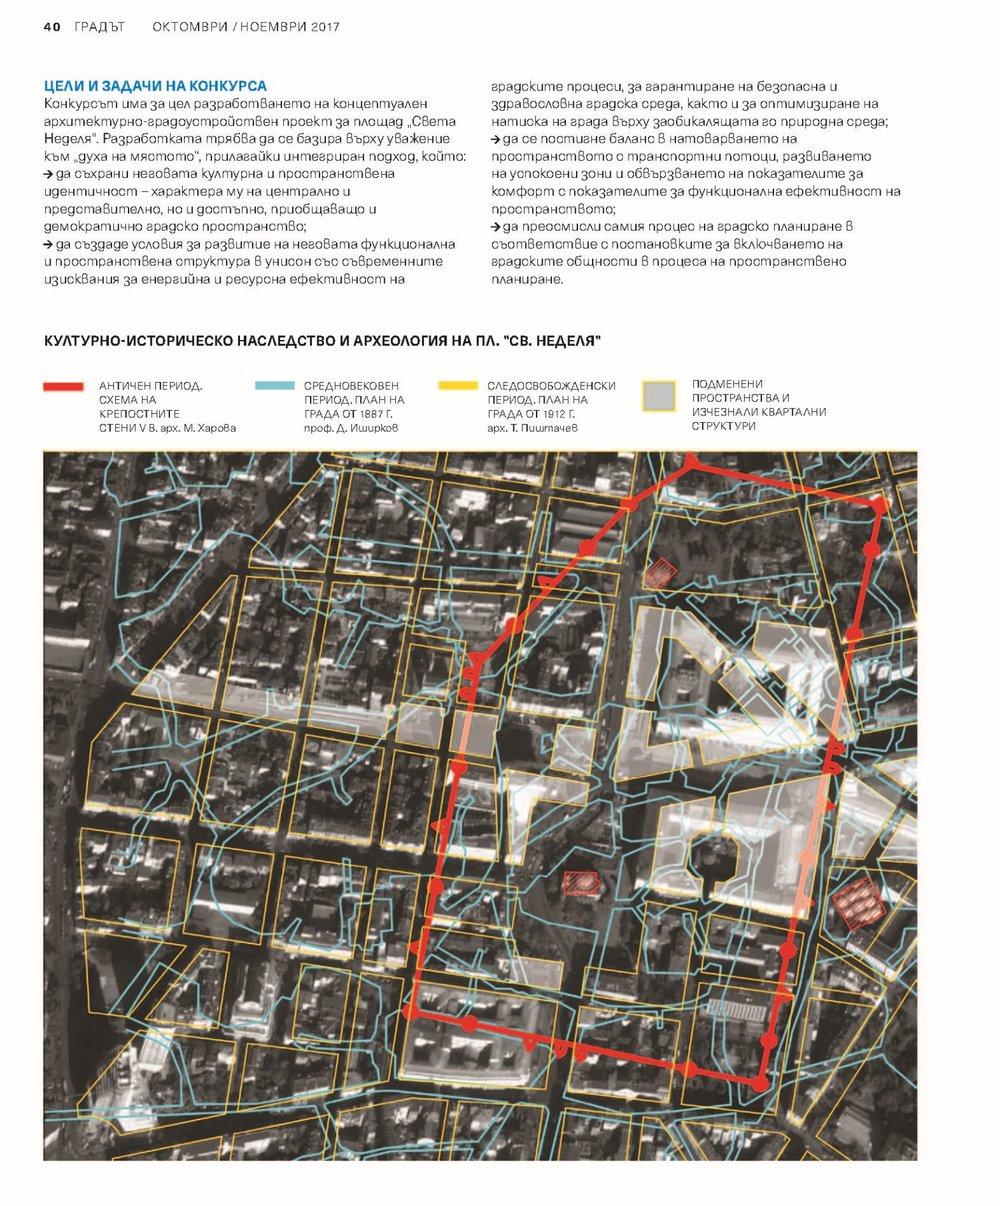 infra5__Page_042.jpg